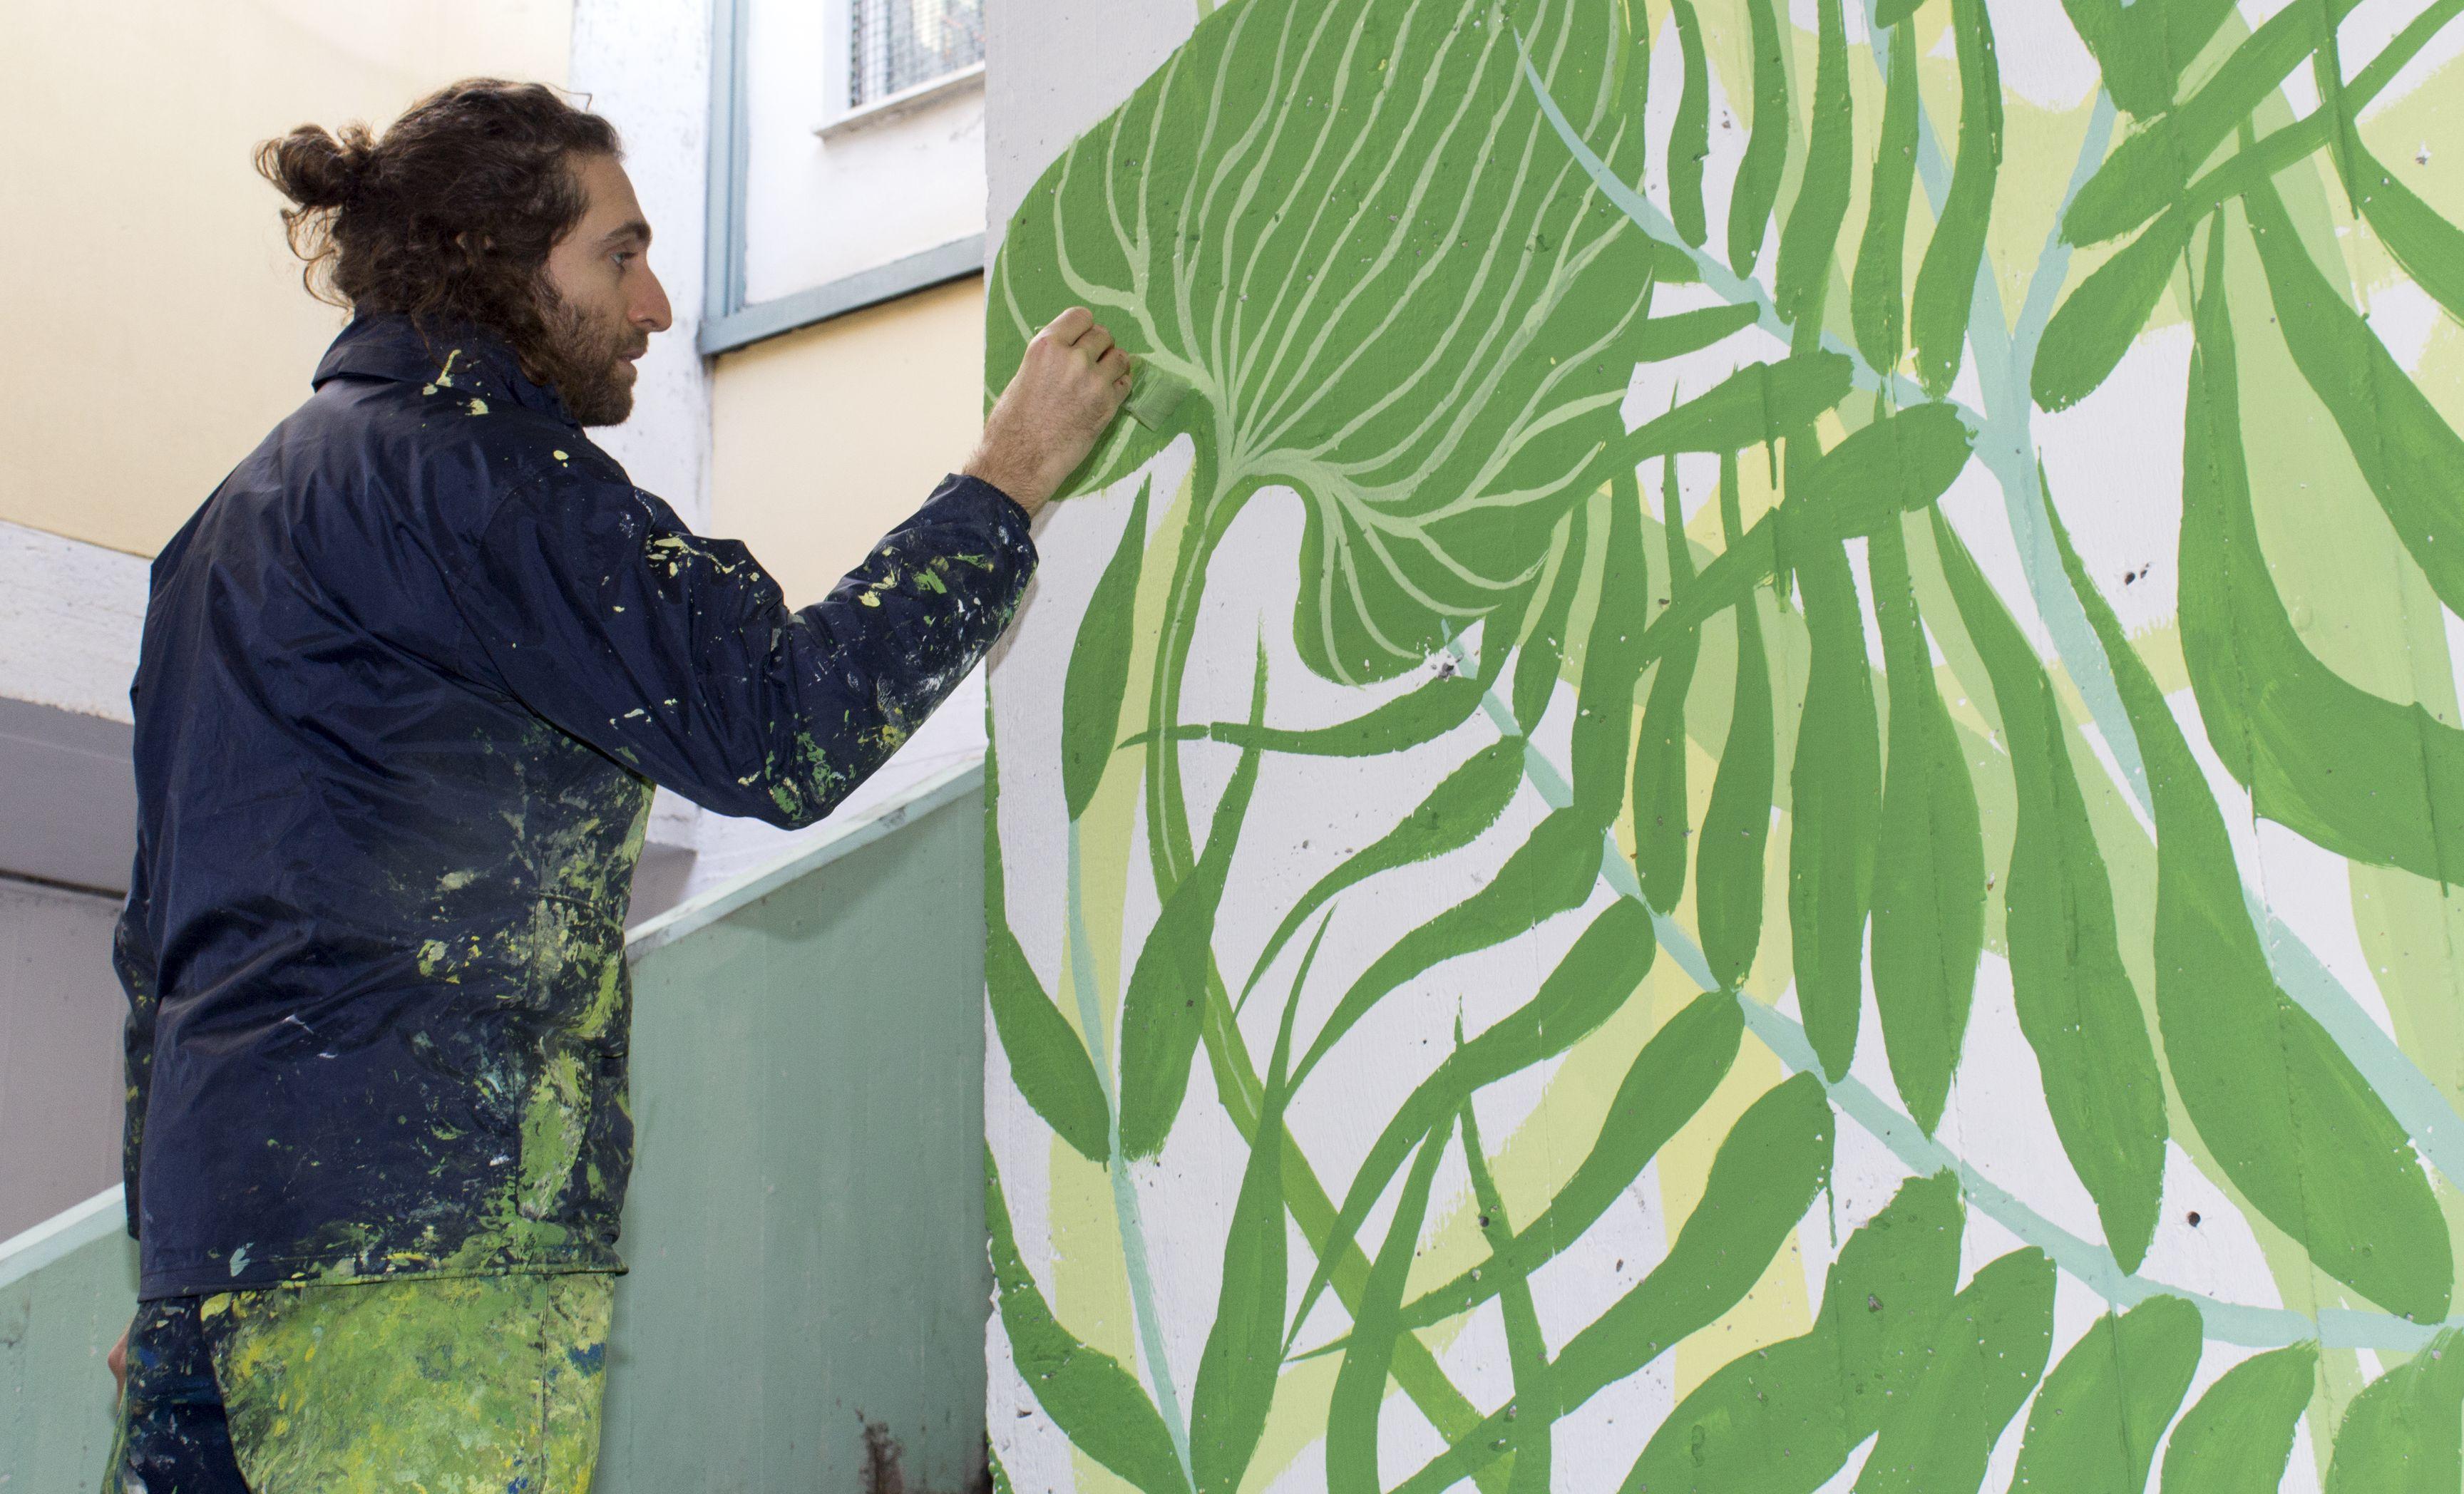 Street Art a Roma: l'opera di Gola Hundun per un progetto di rigenerazione